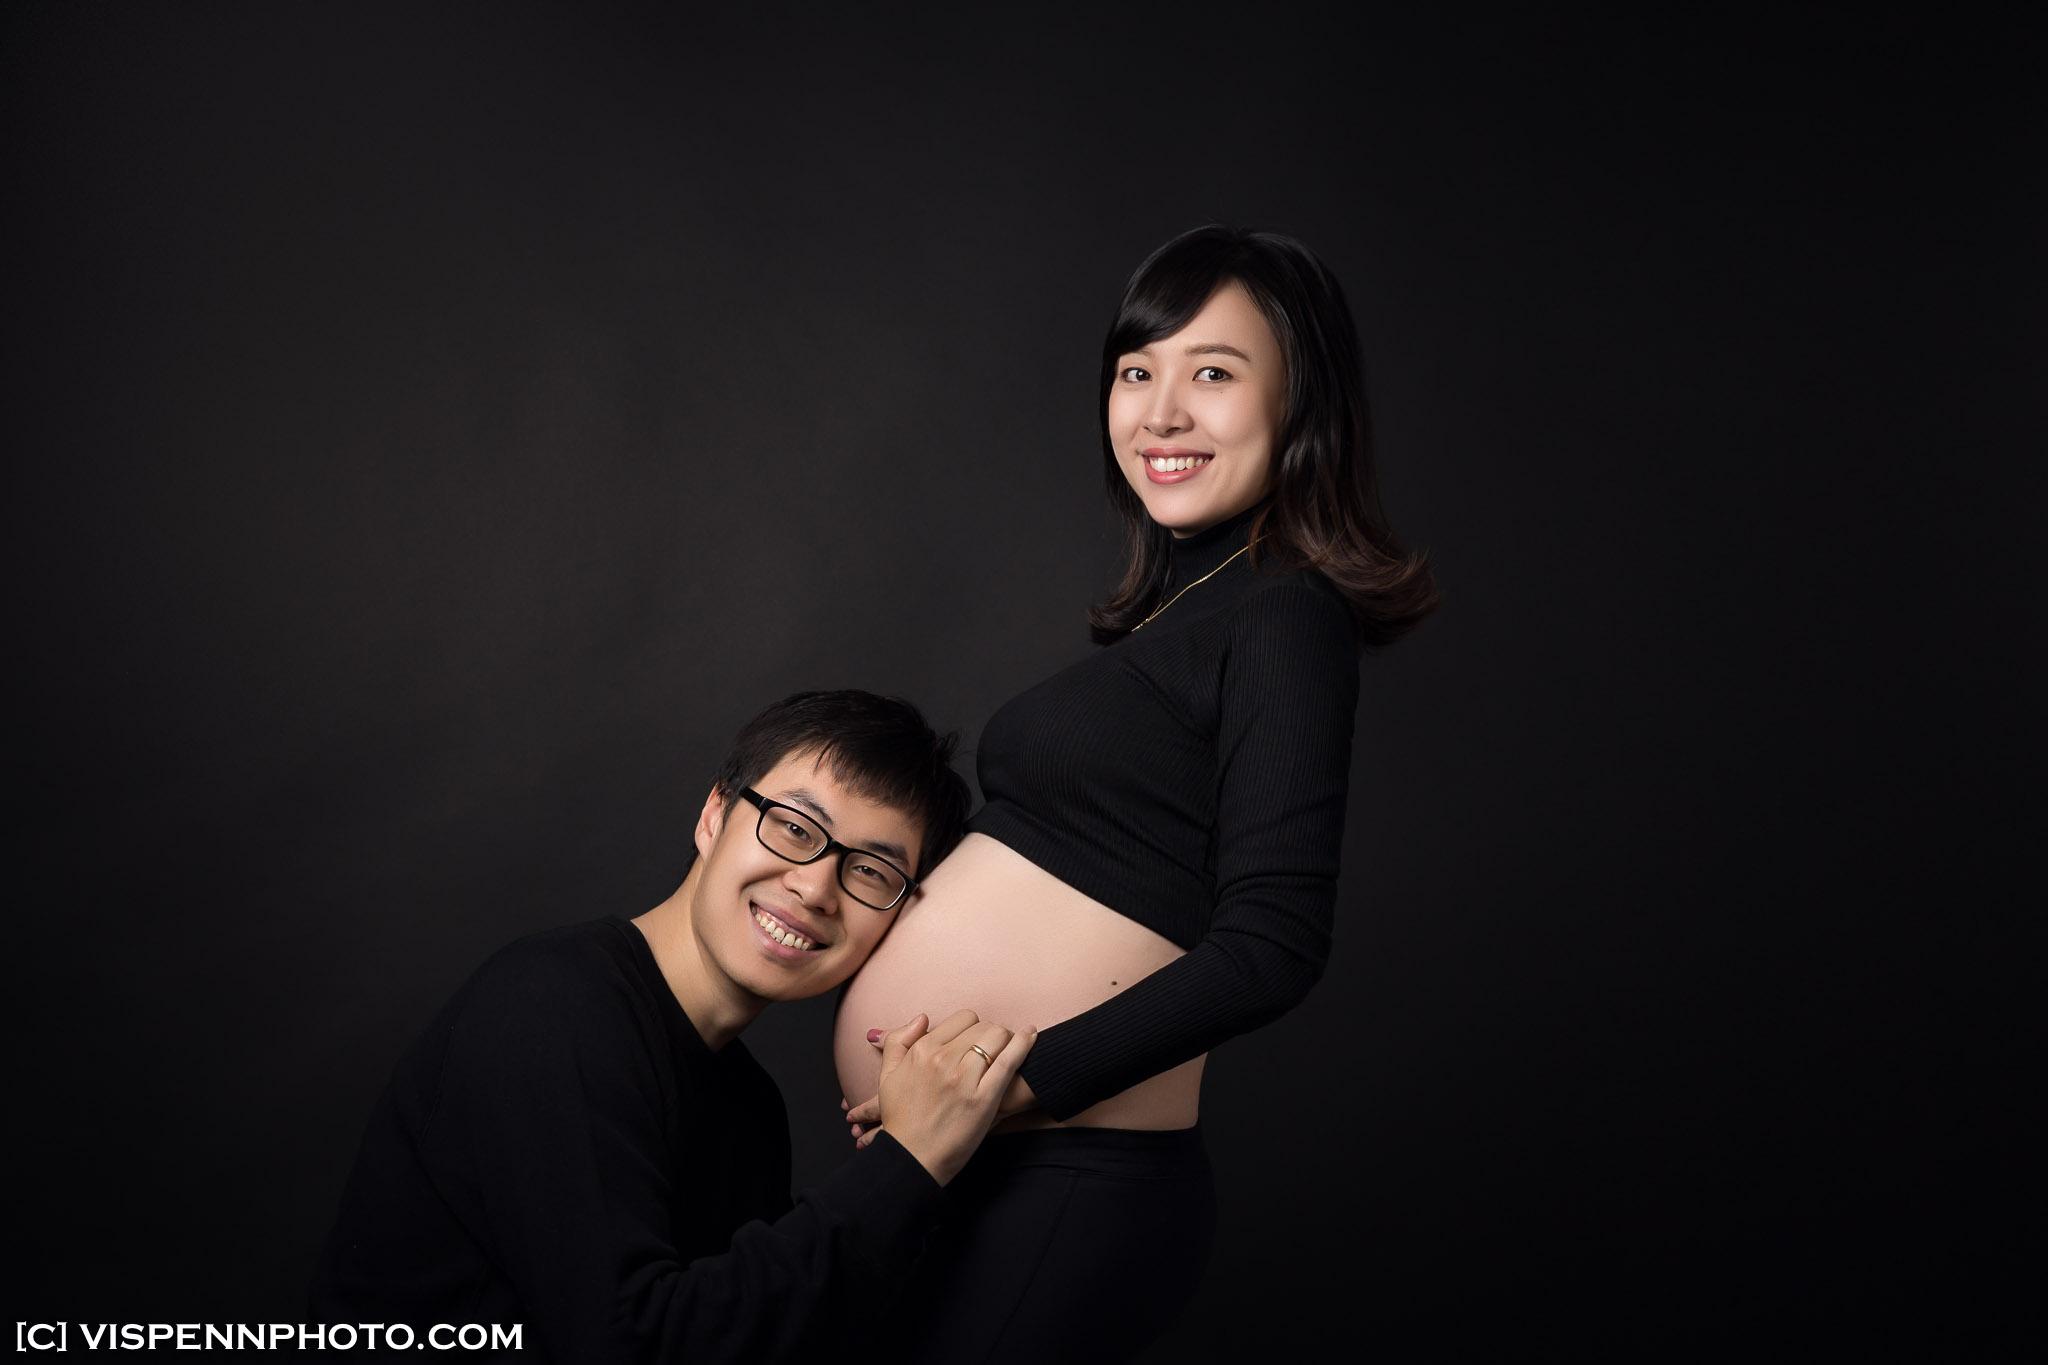 Melbourne Newborn Baby Maternity Family Photo VISPENN 墨尔本 孕妇照 大肚照 QinLIU 1543 VISPENN